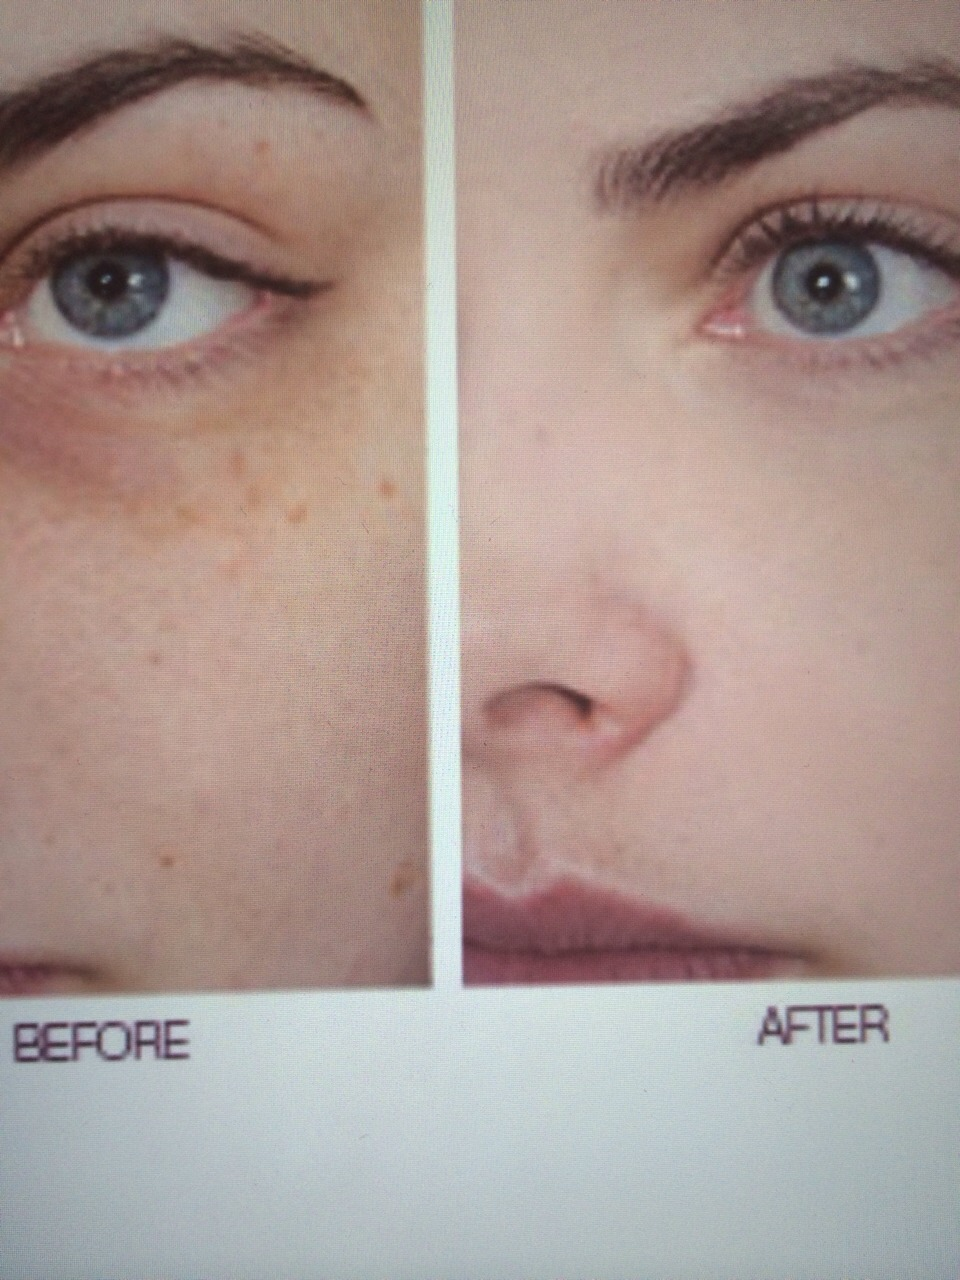 how to get rid of dark circles under eyes spoon